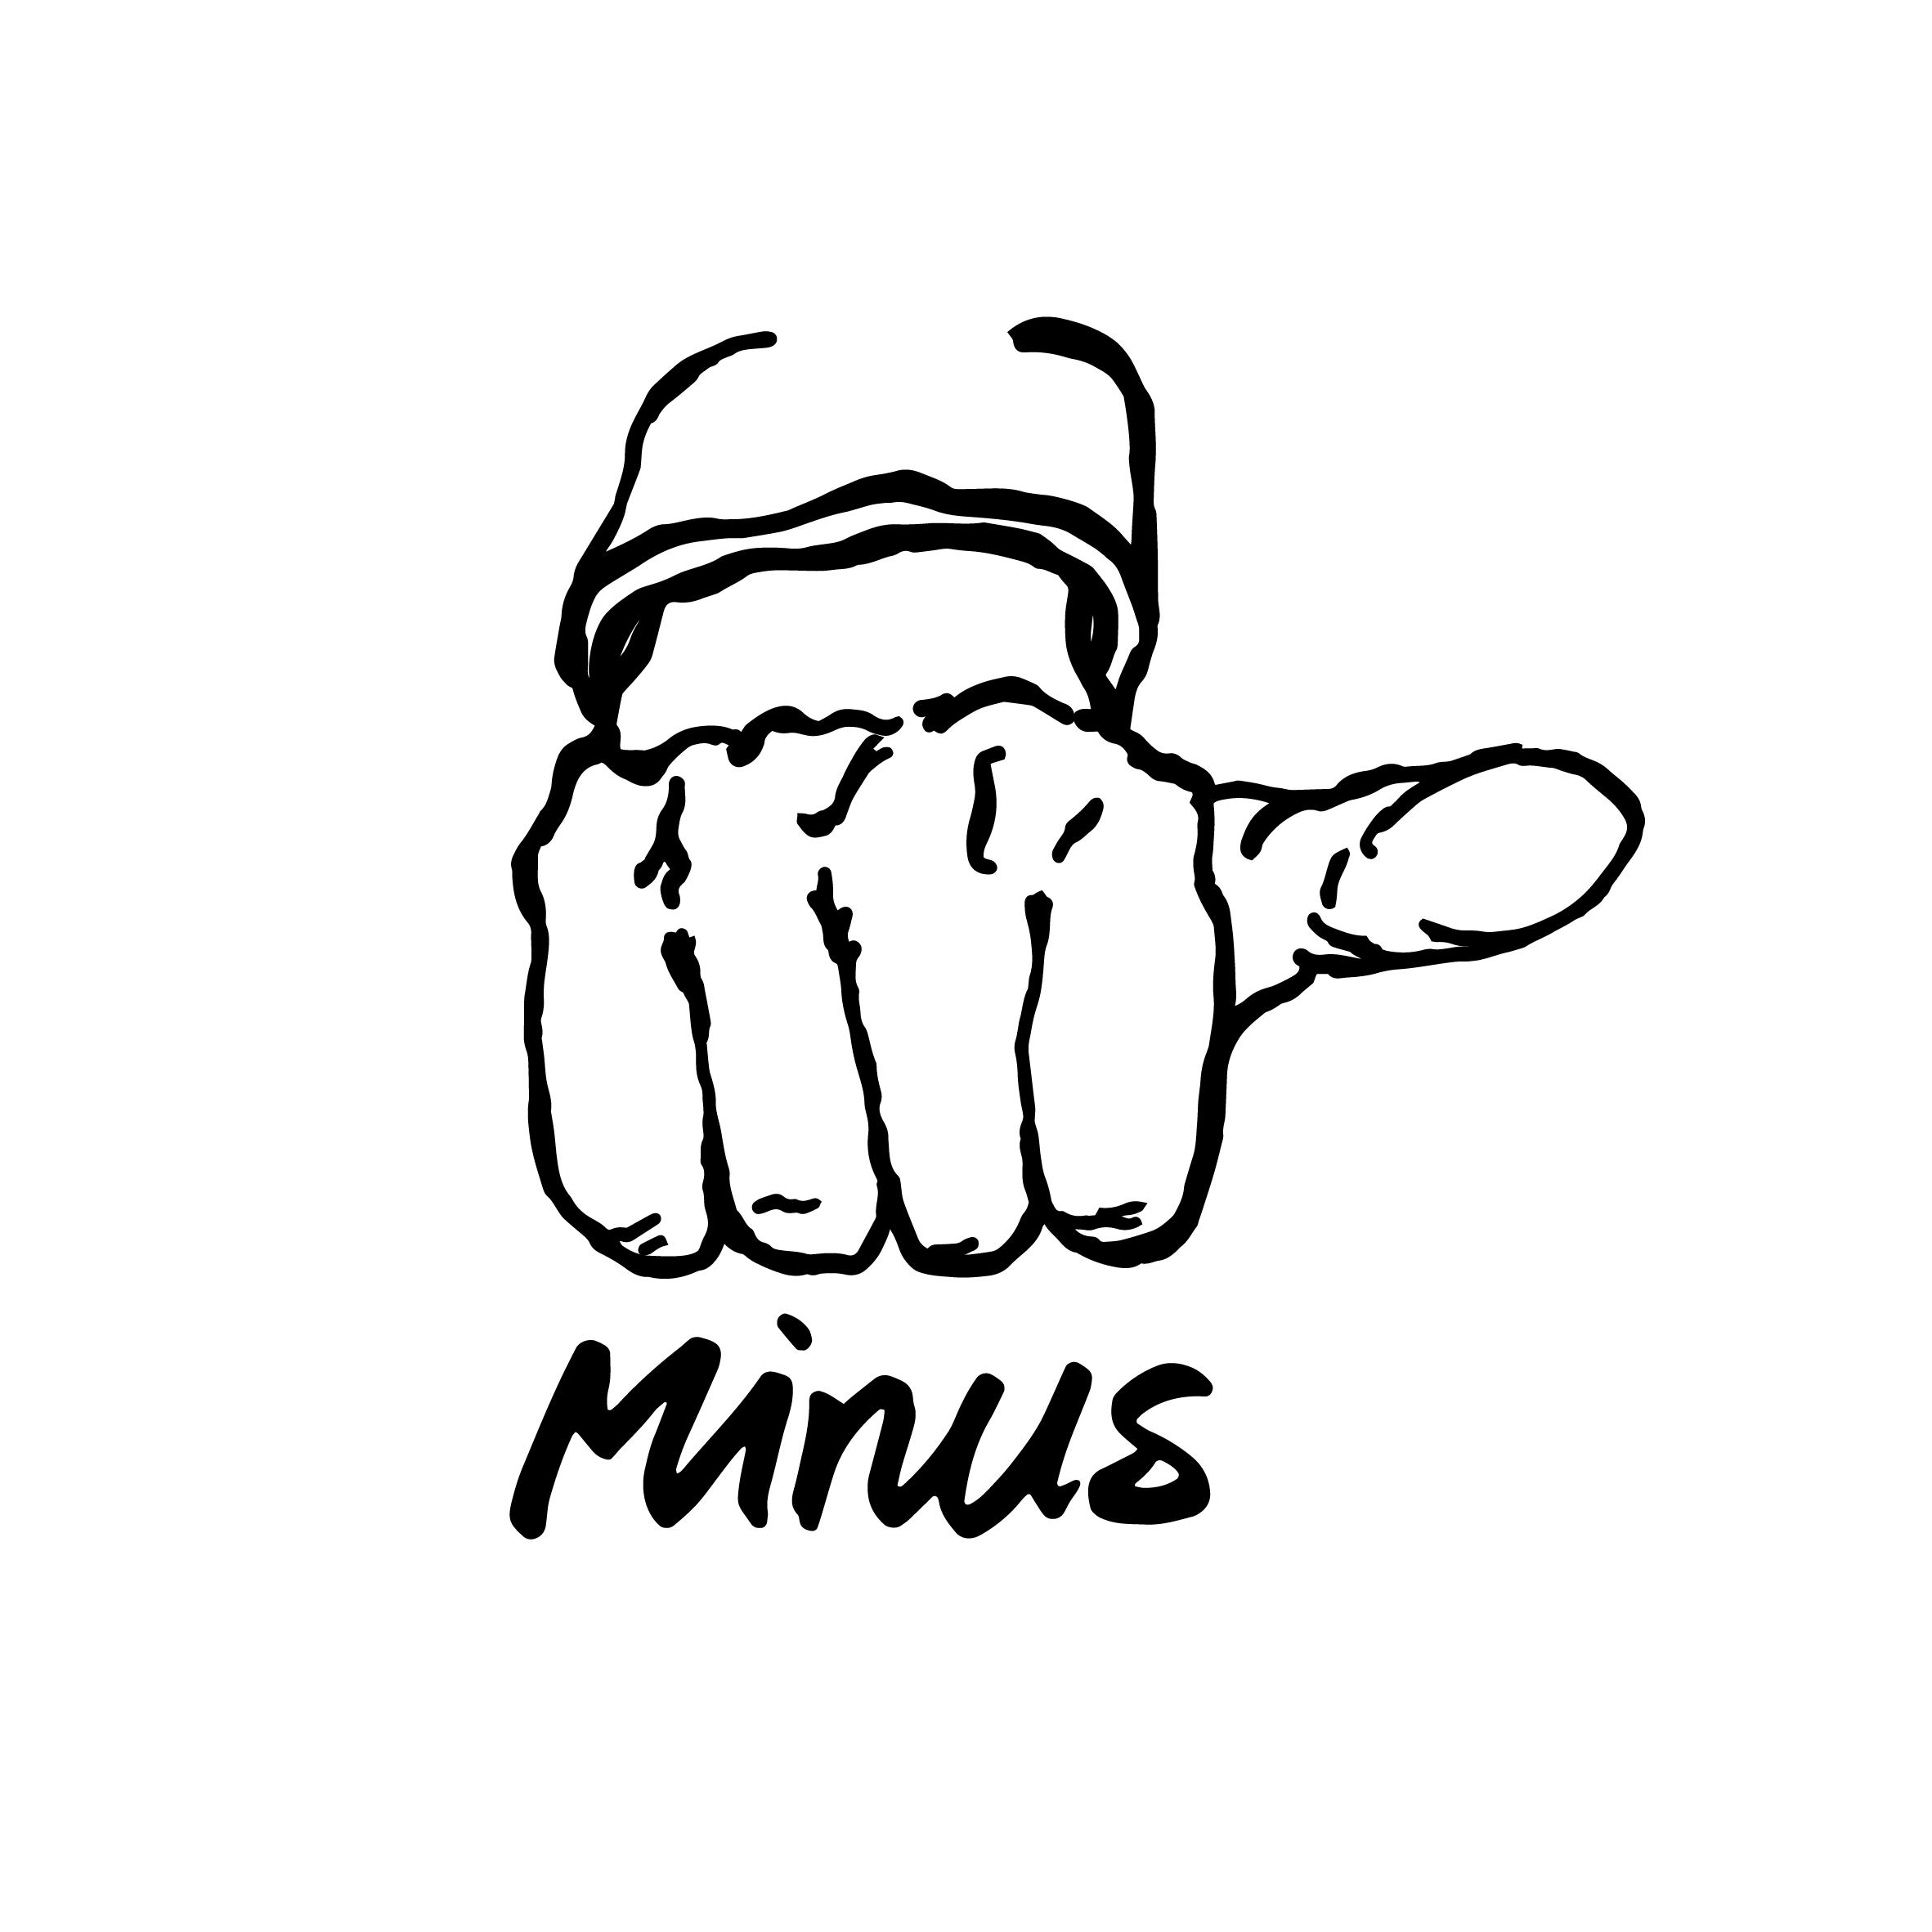 Minus_6